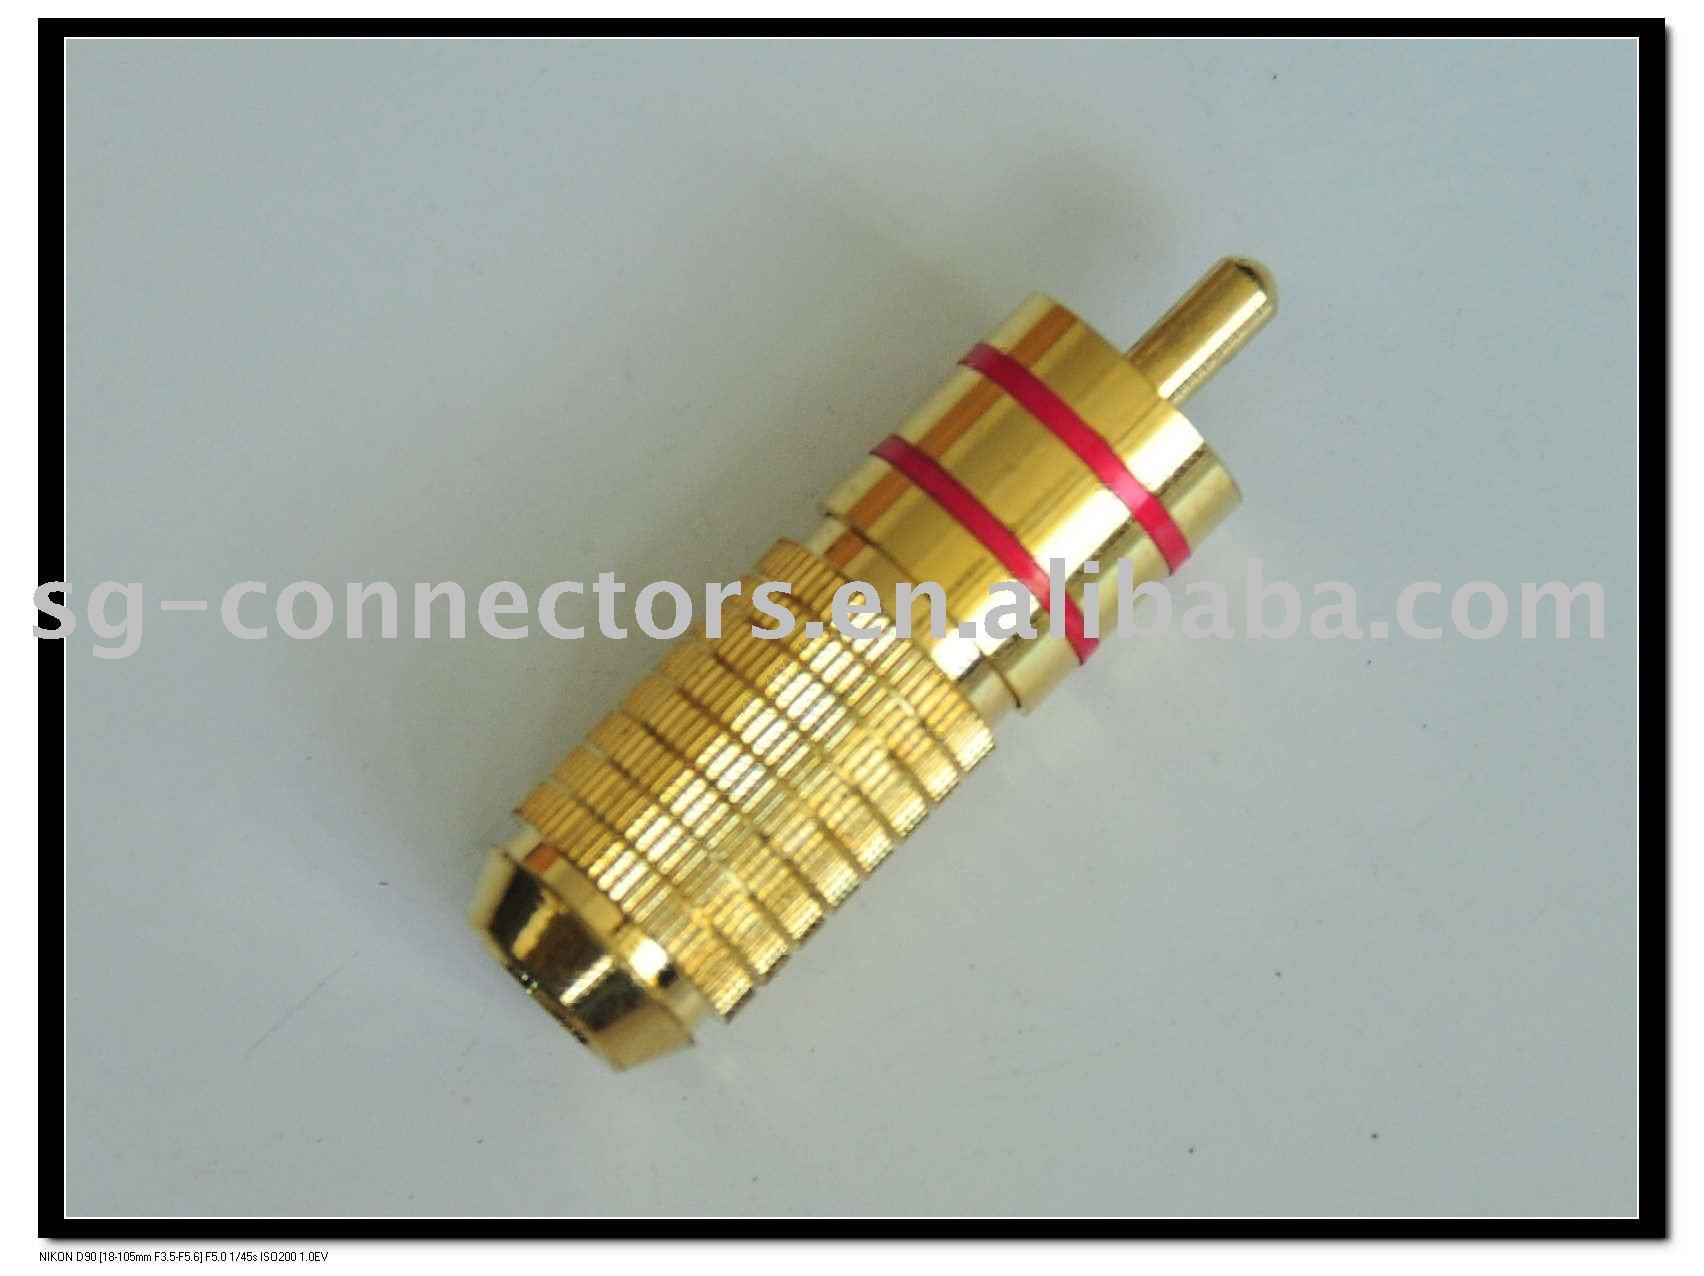 Rca Plug To Speaker Wire/rca Plug - Buy Rca Plug To Speaker Wire ...